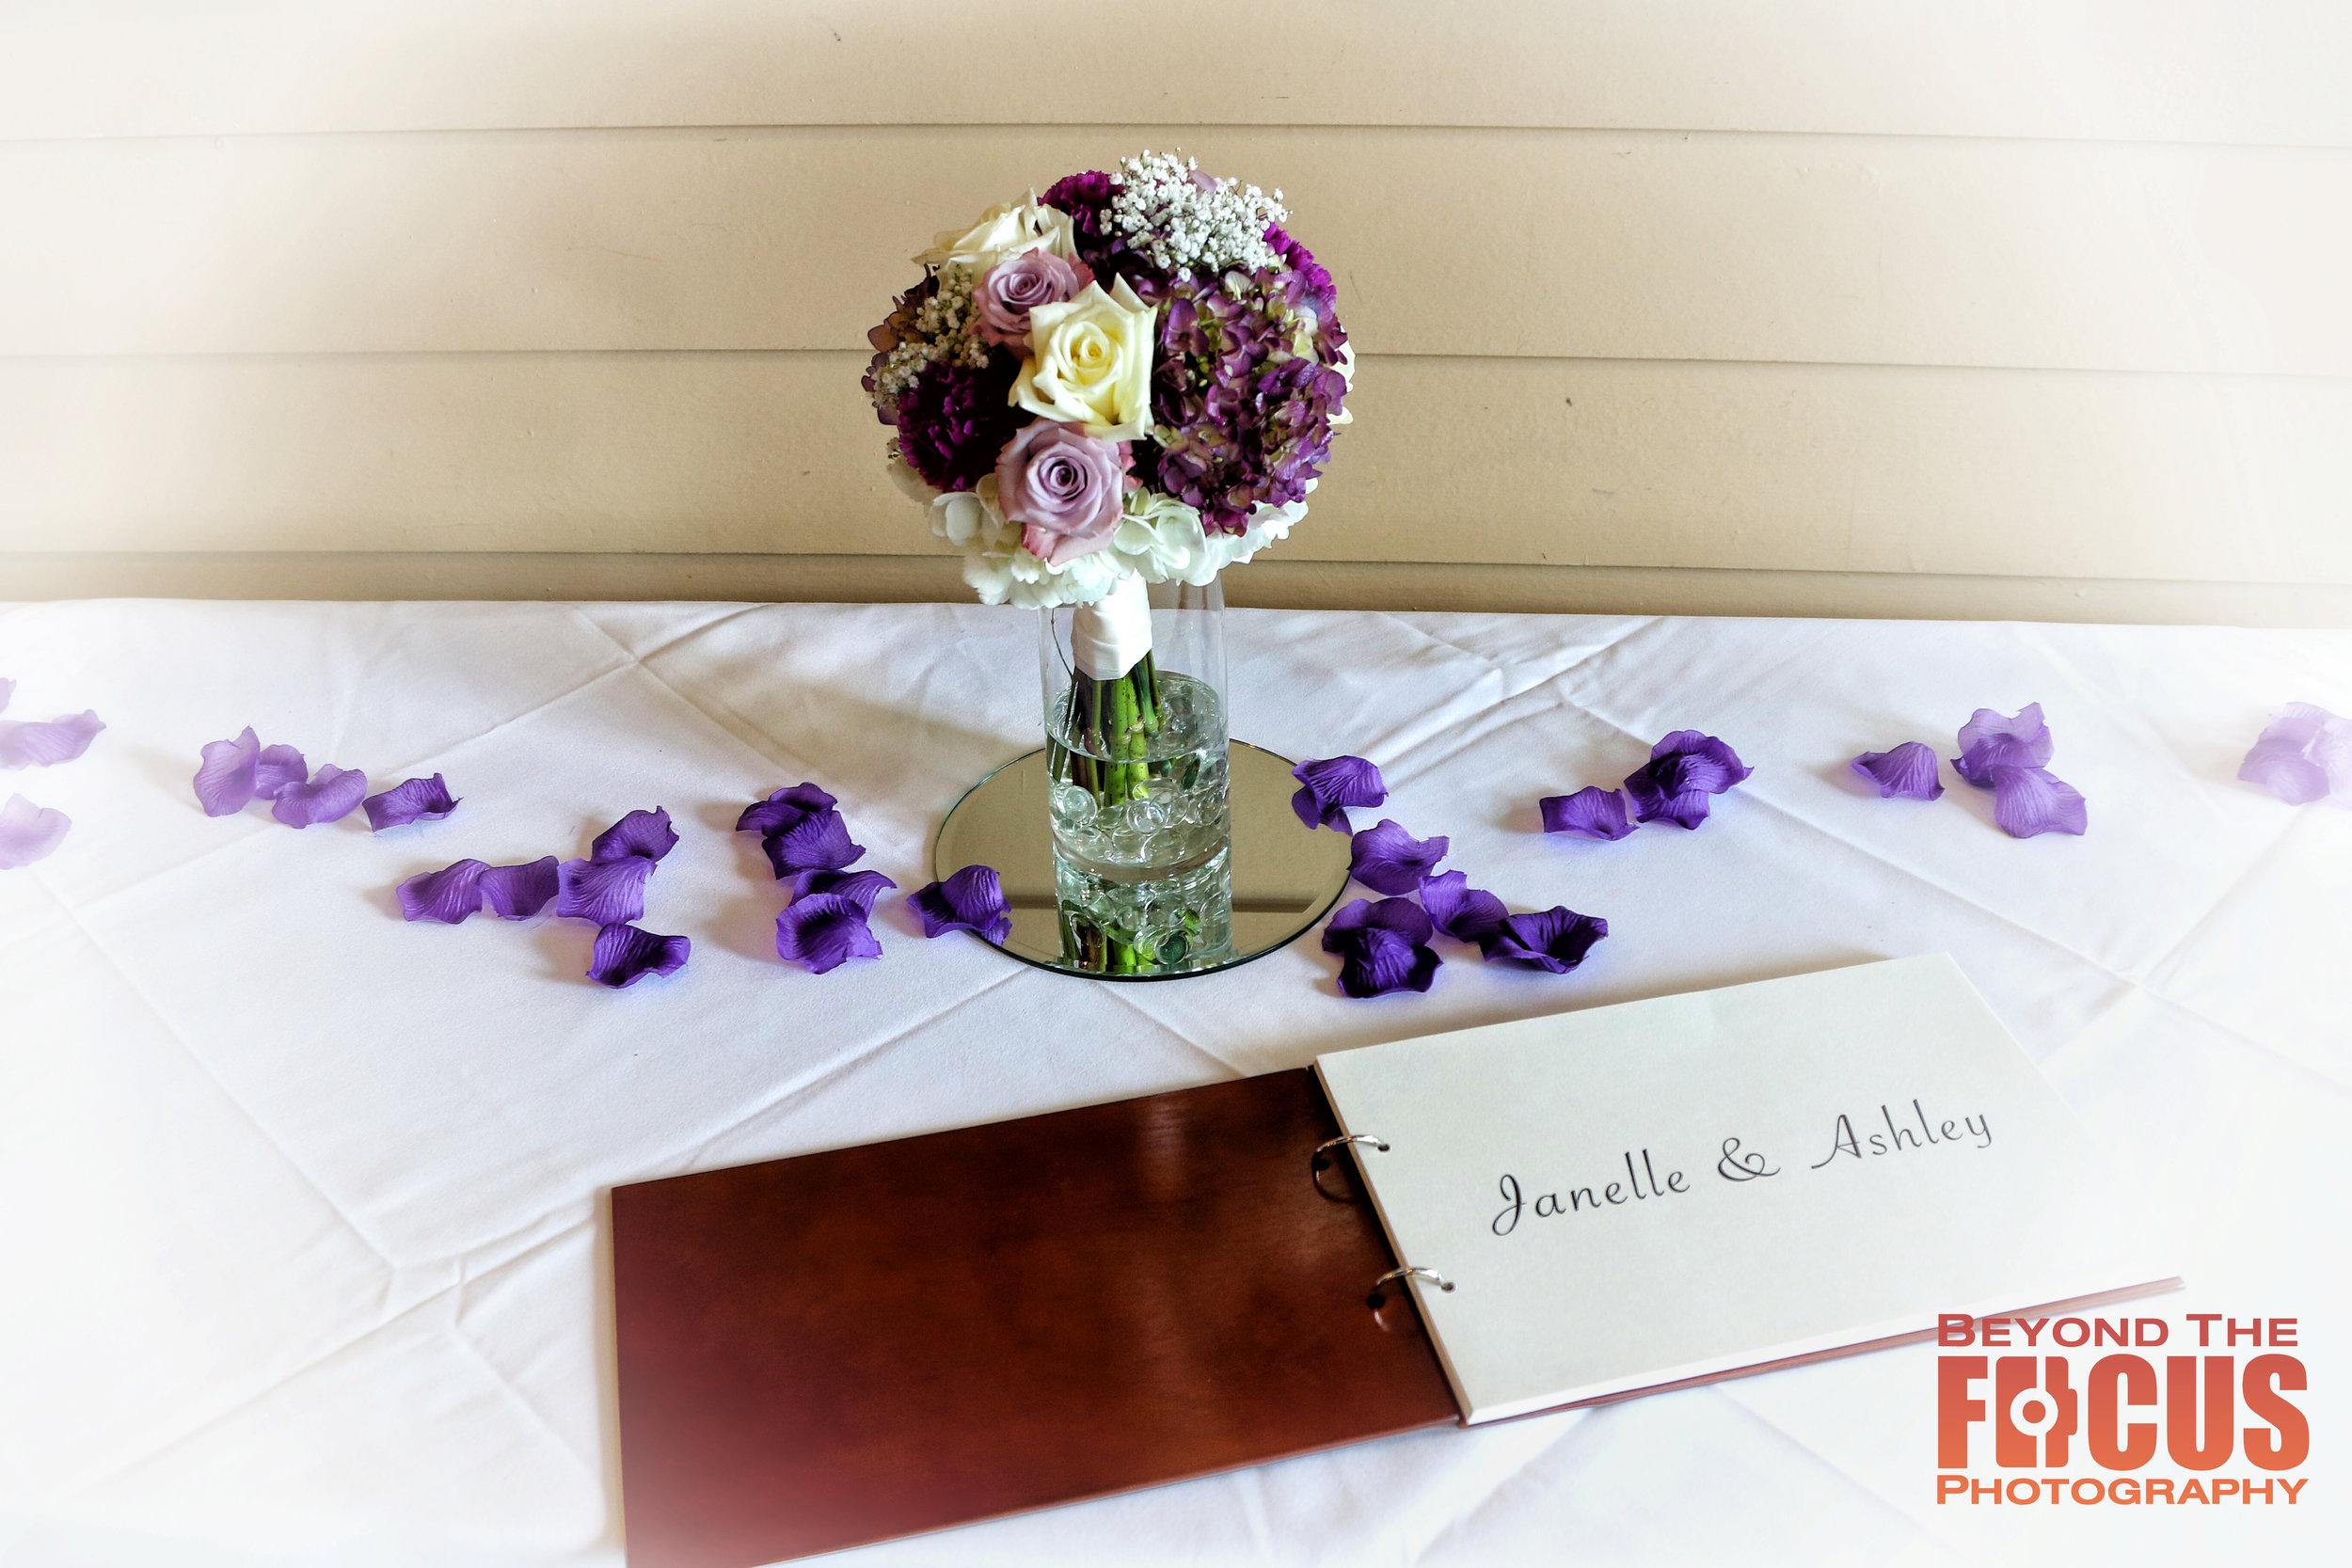 Ashley Janelle Pre Wedding 19.jpg